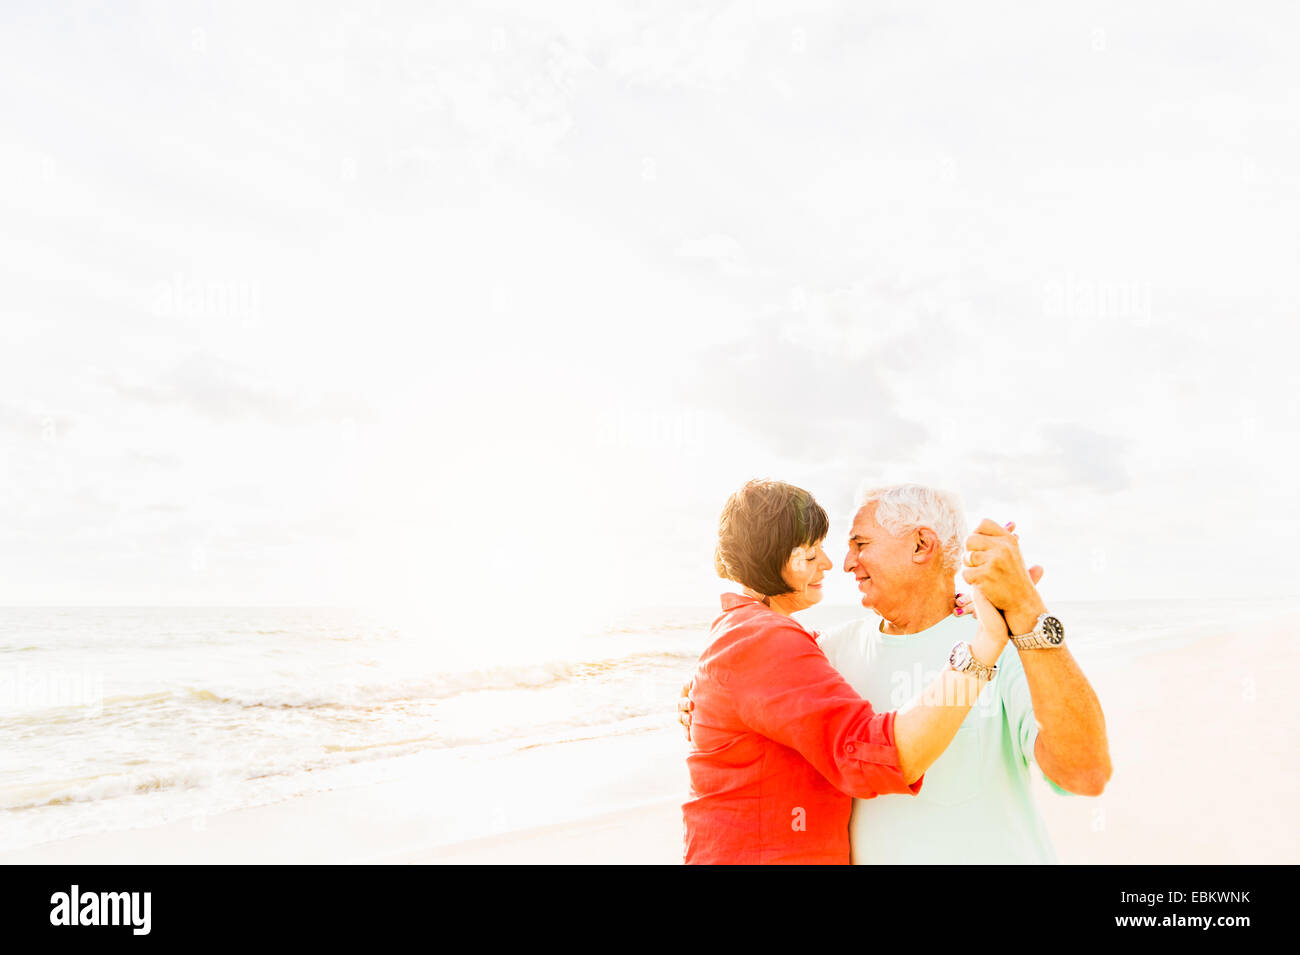 USA, Florida, Jupiter, Couple dancing on beach at sunrise - Stock Image